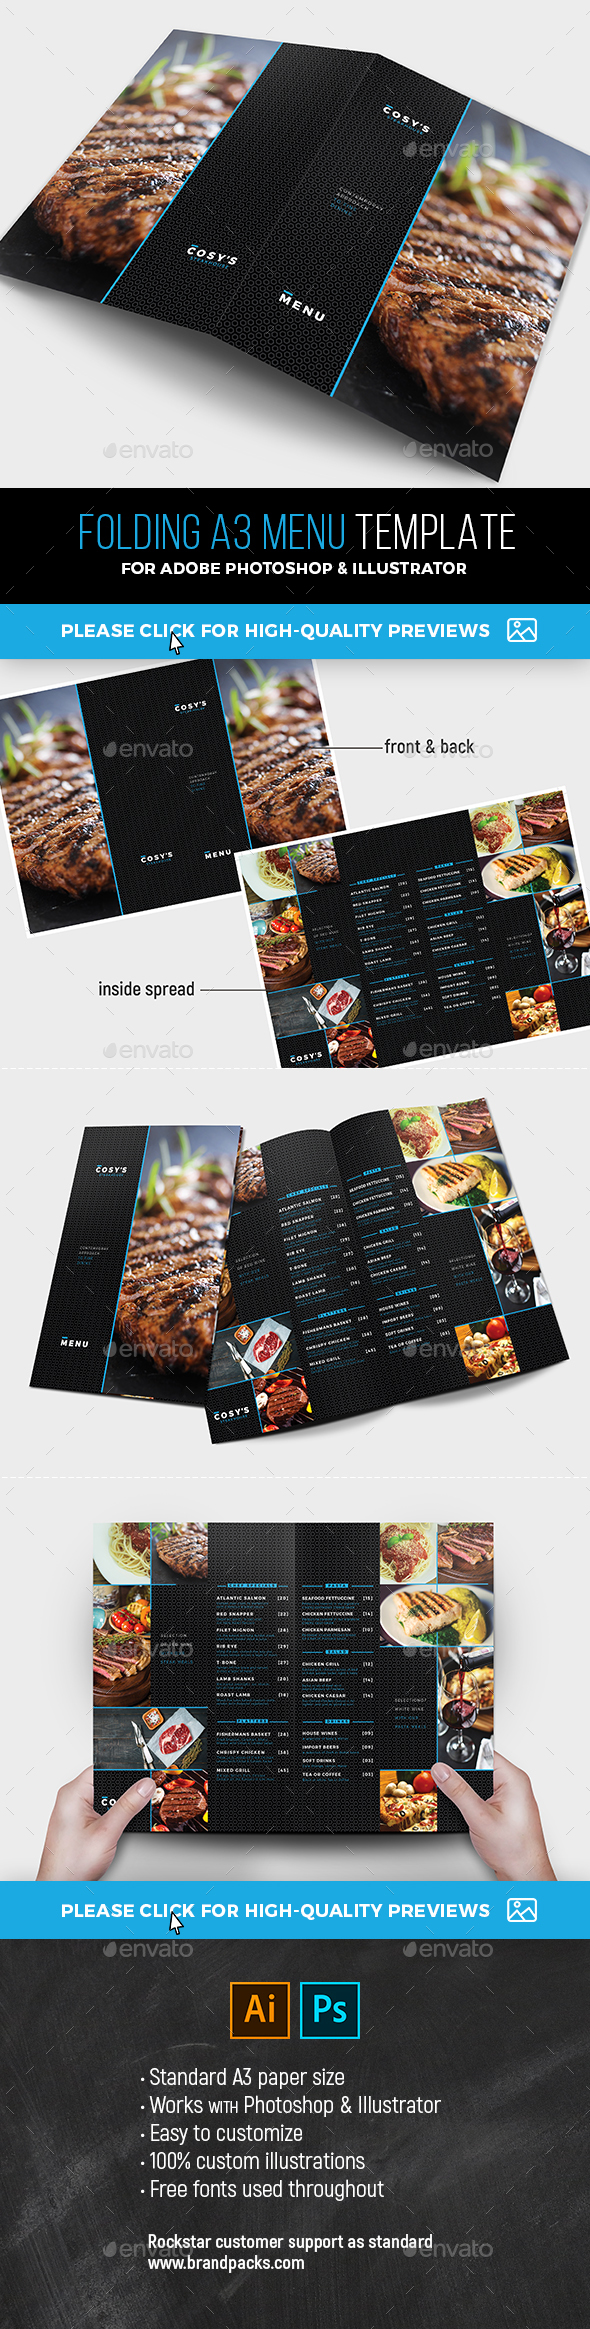 Folding A3 Menu Template - Food Menus Print Templates